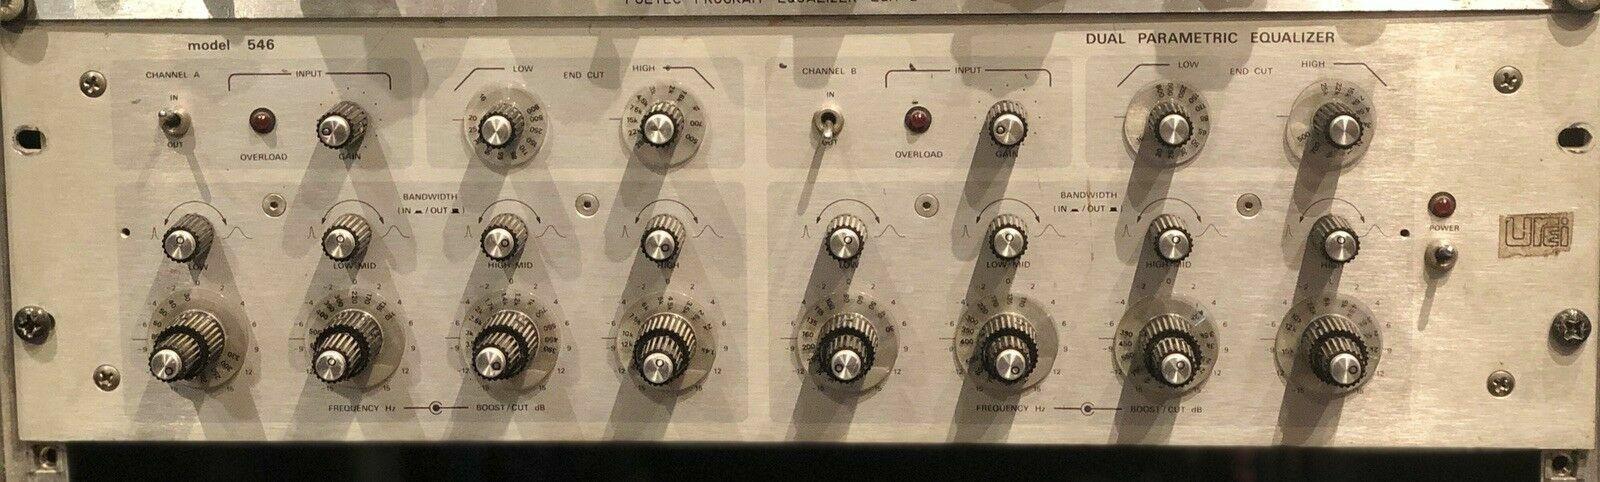 Urei 546 Vintage Stereo Parametric EQ